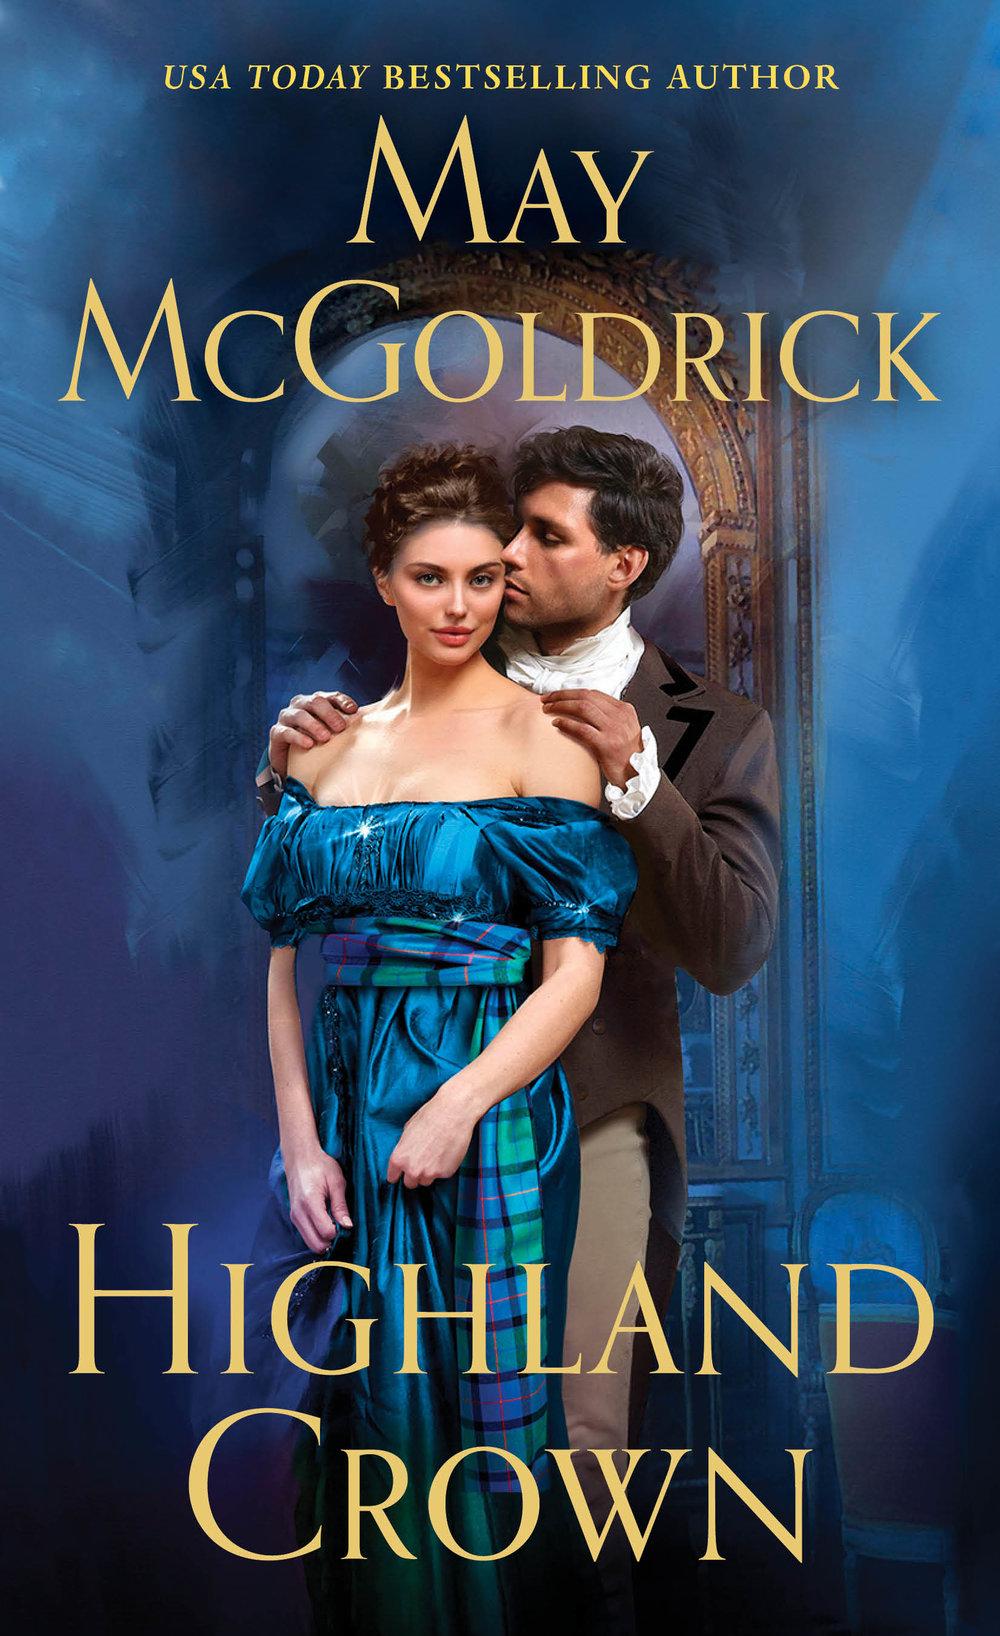 HighlandCrown-mm new cover.jpg